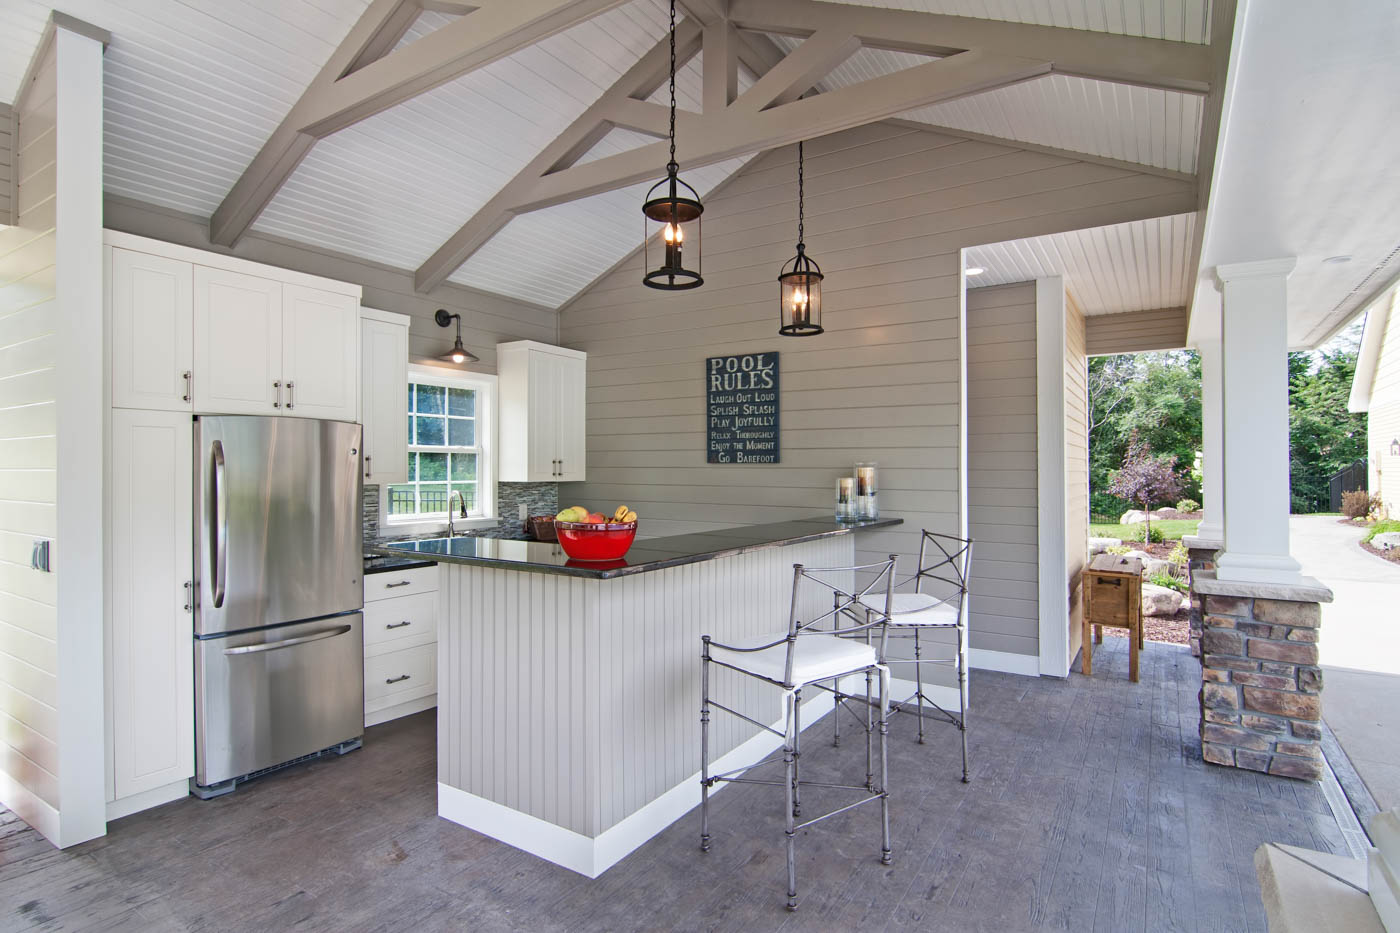 Outdoor Living Space Design twin cities outdoor living space design-3 - james barton